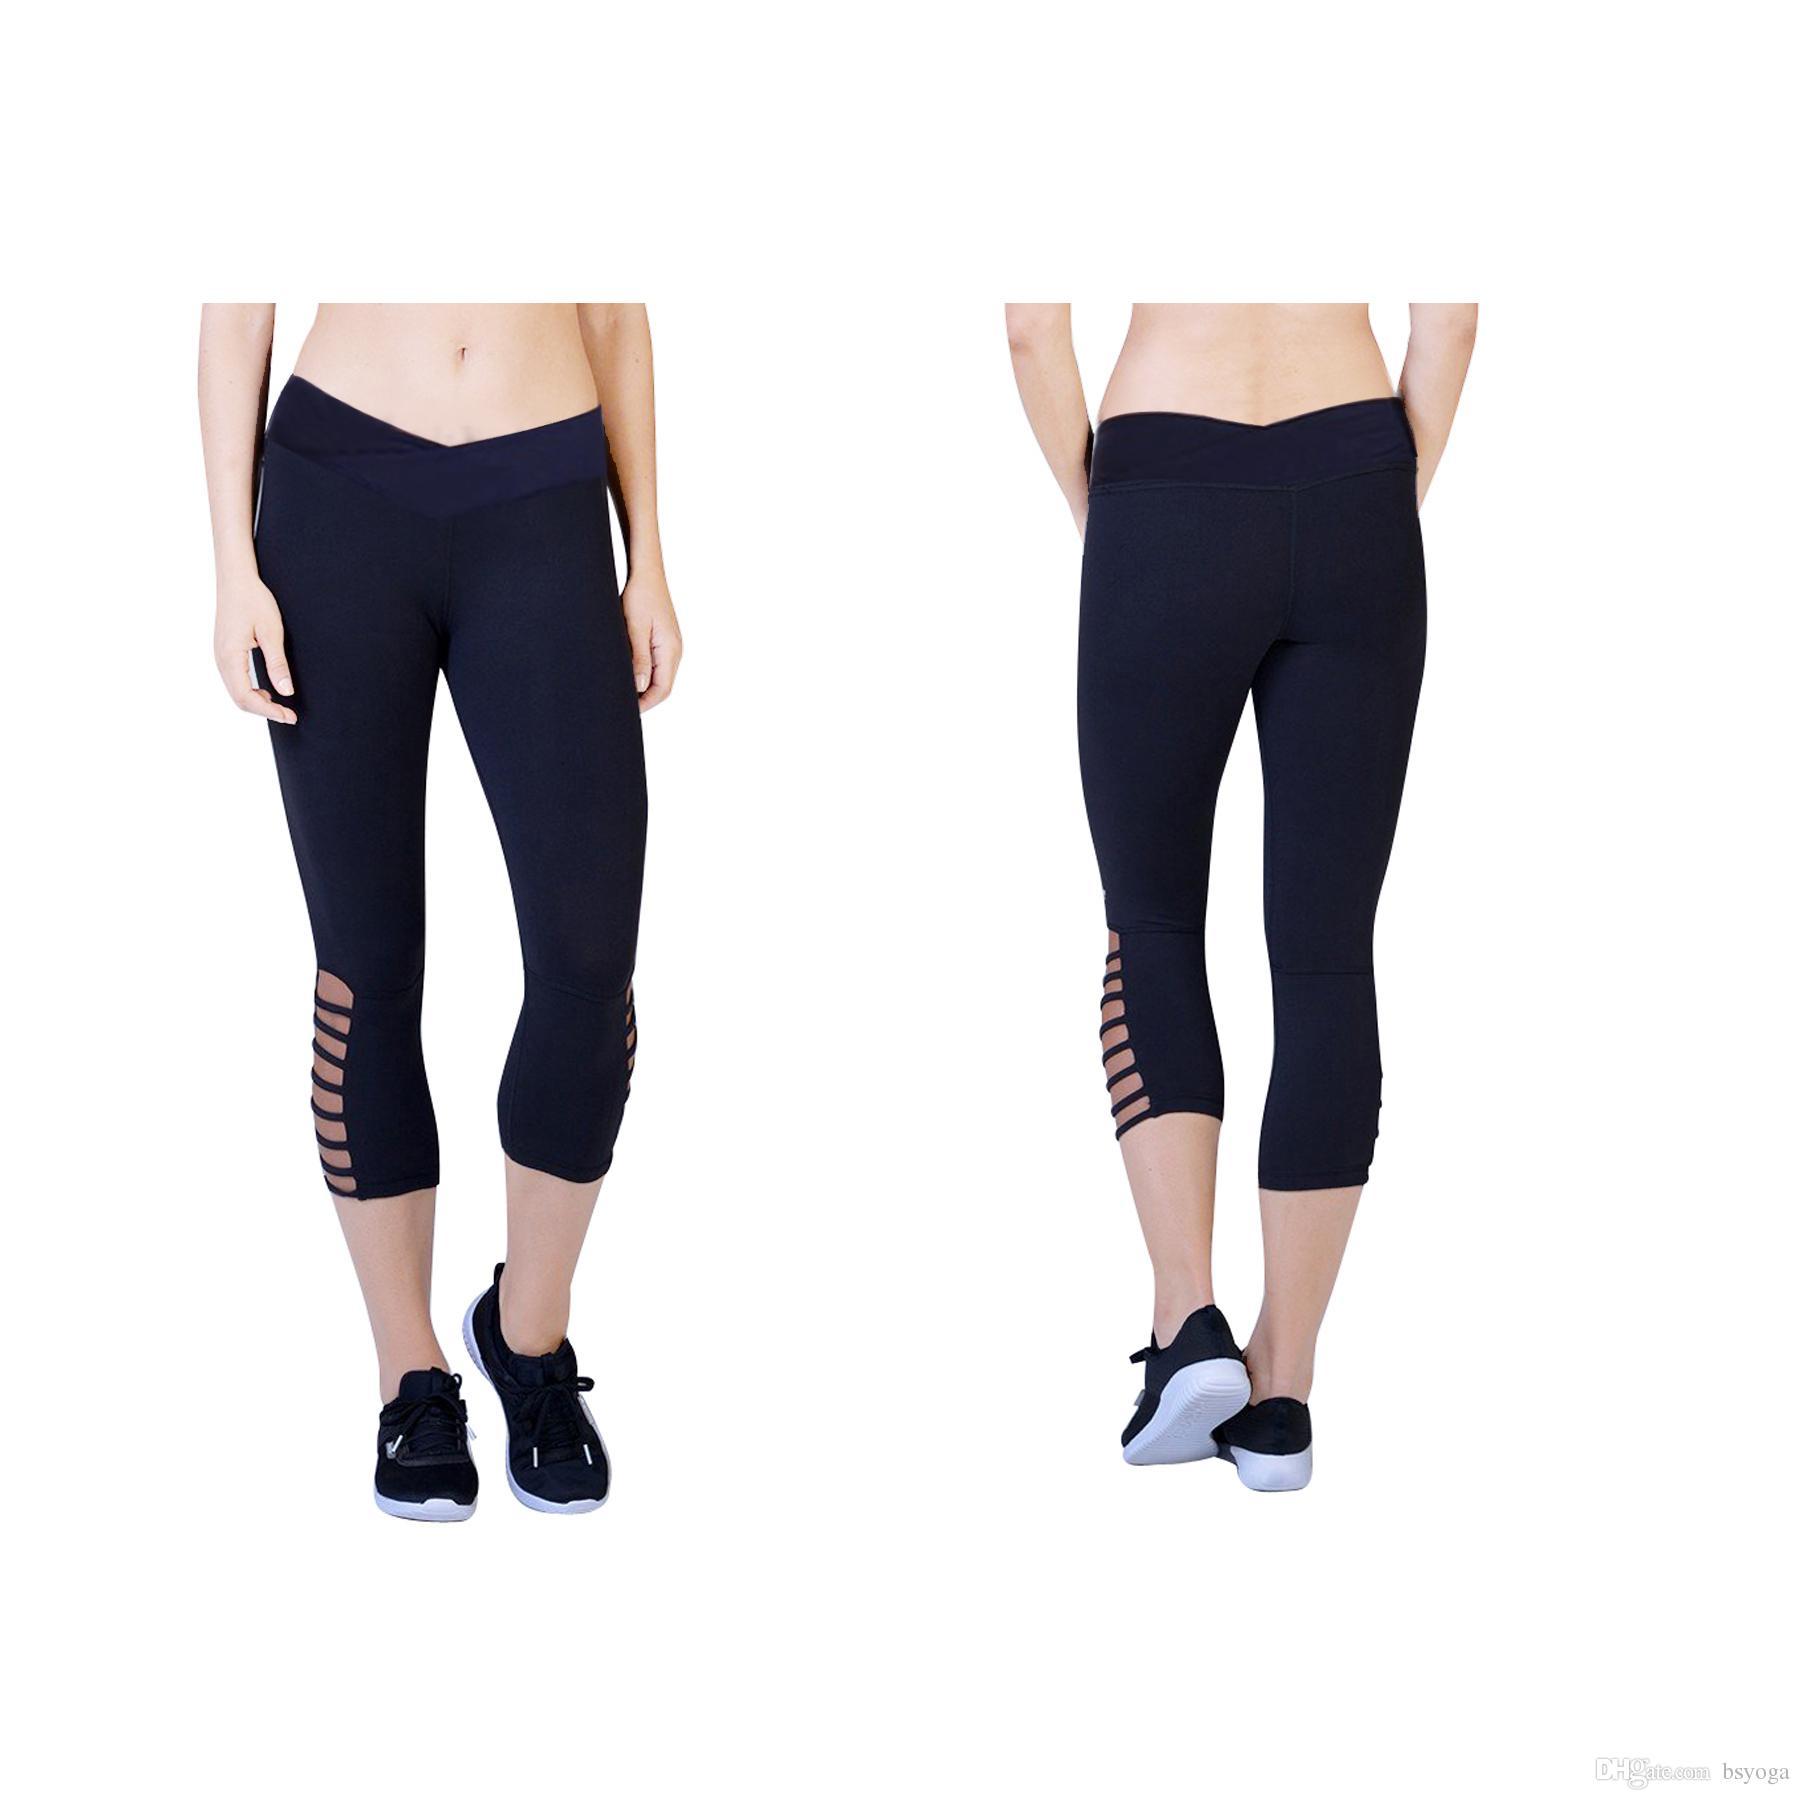 88c46a9f00666 Brand New B&S YOGA Mid Rise Capri Black Women's Leggings Sports ...